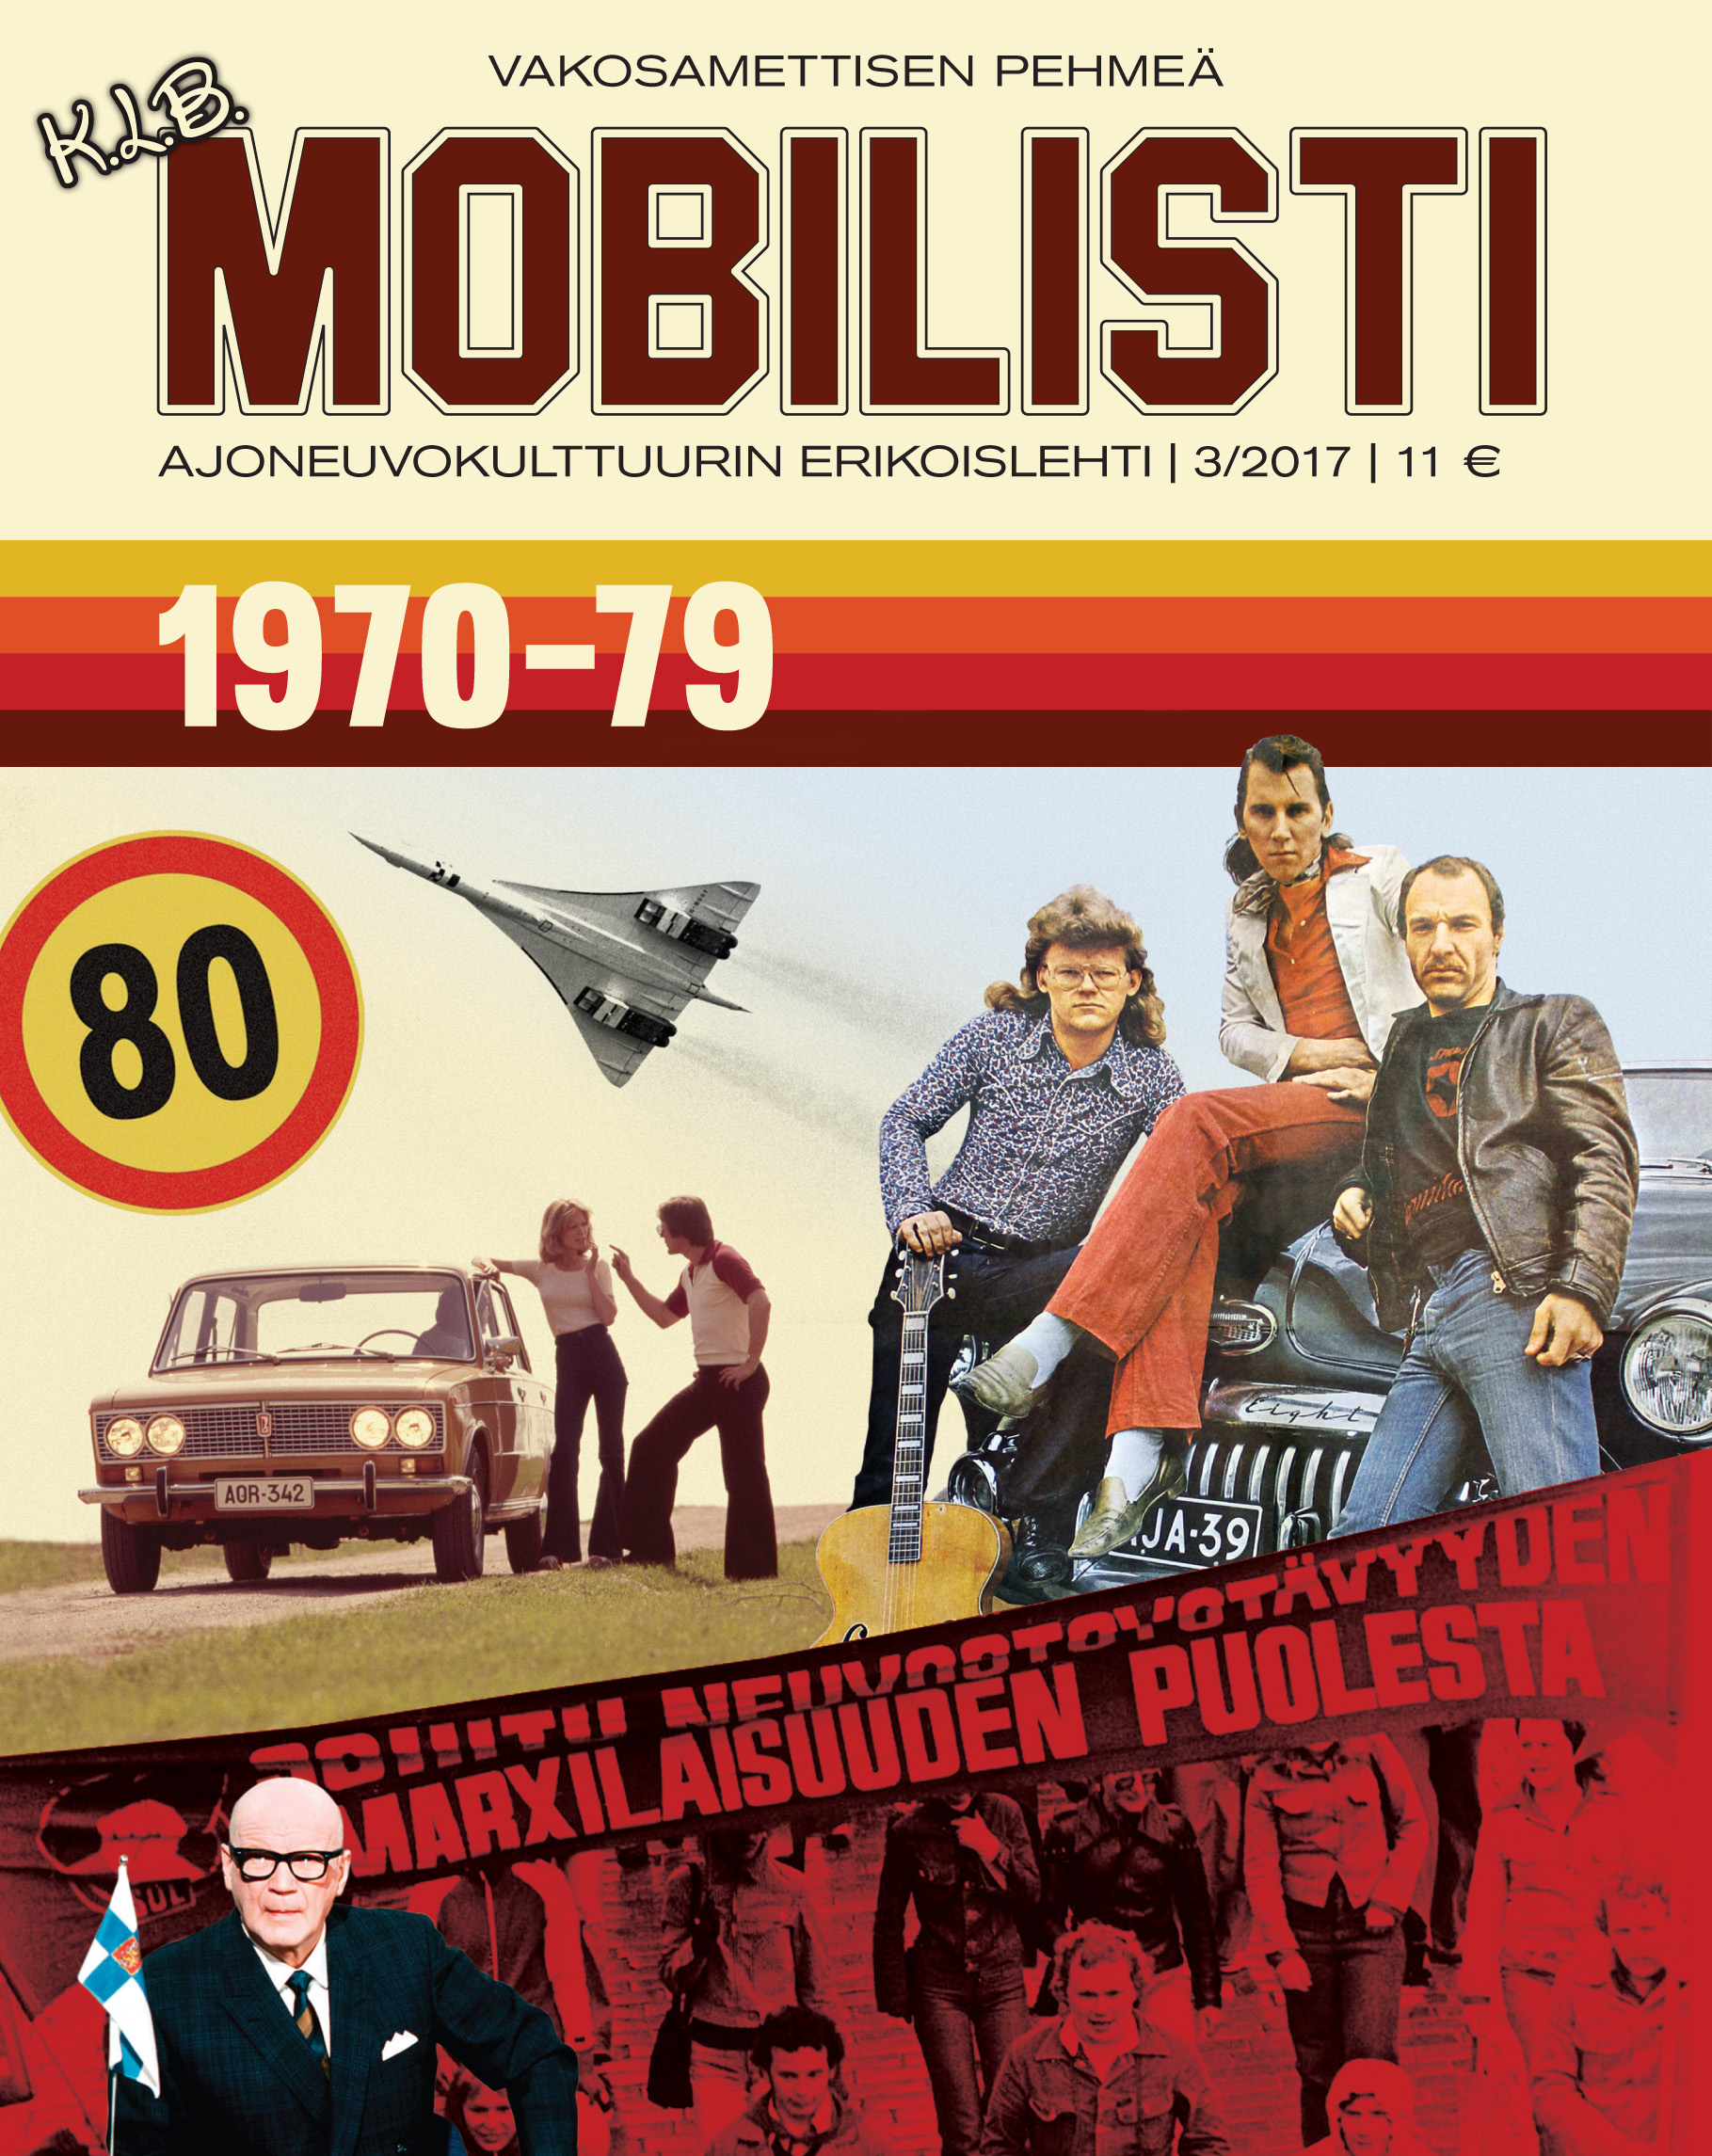 Mobilisti 317 -kansi_1